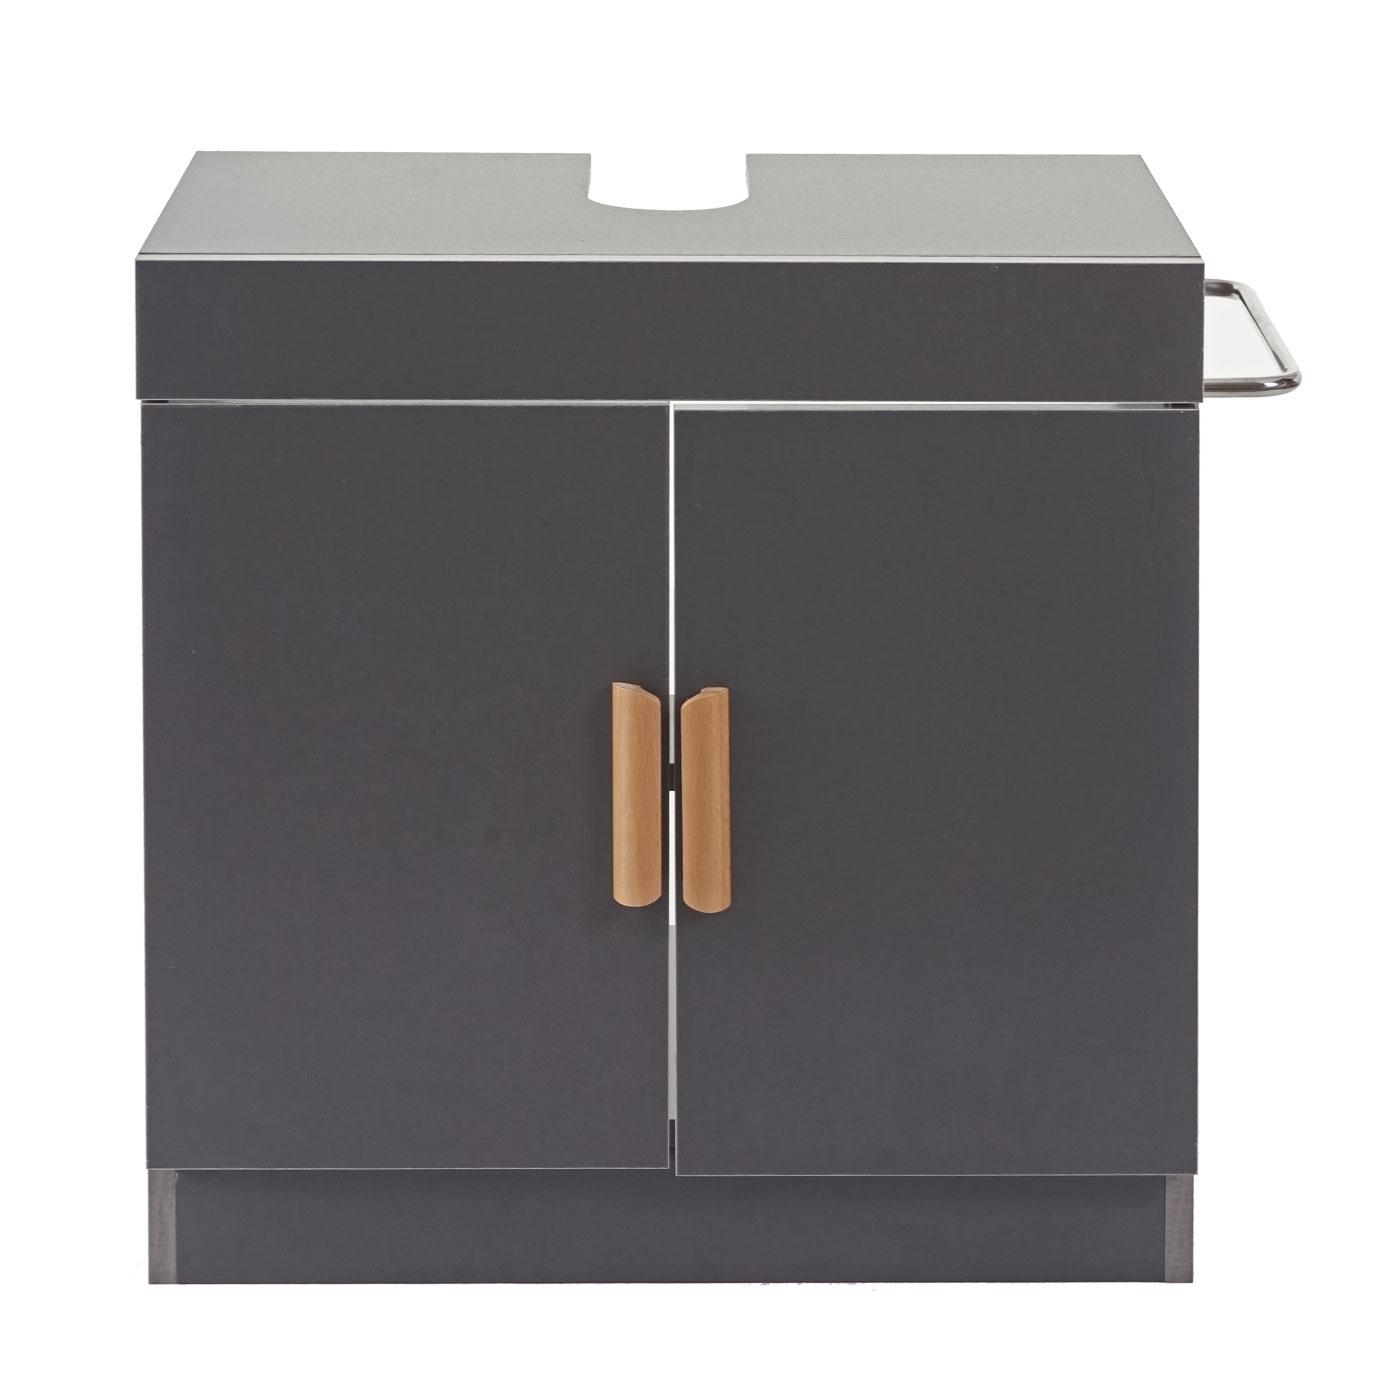 Waschbeckenunterschrank HWC-D55